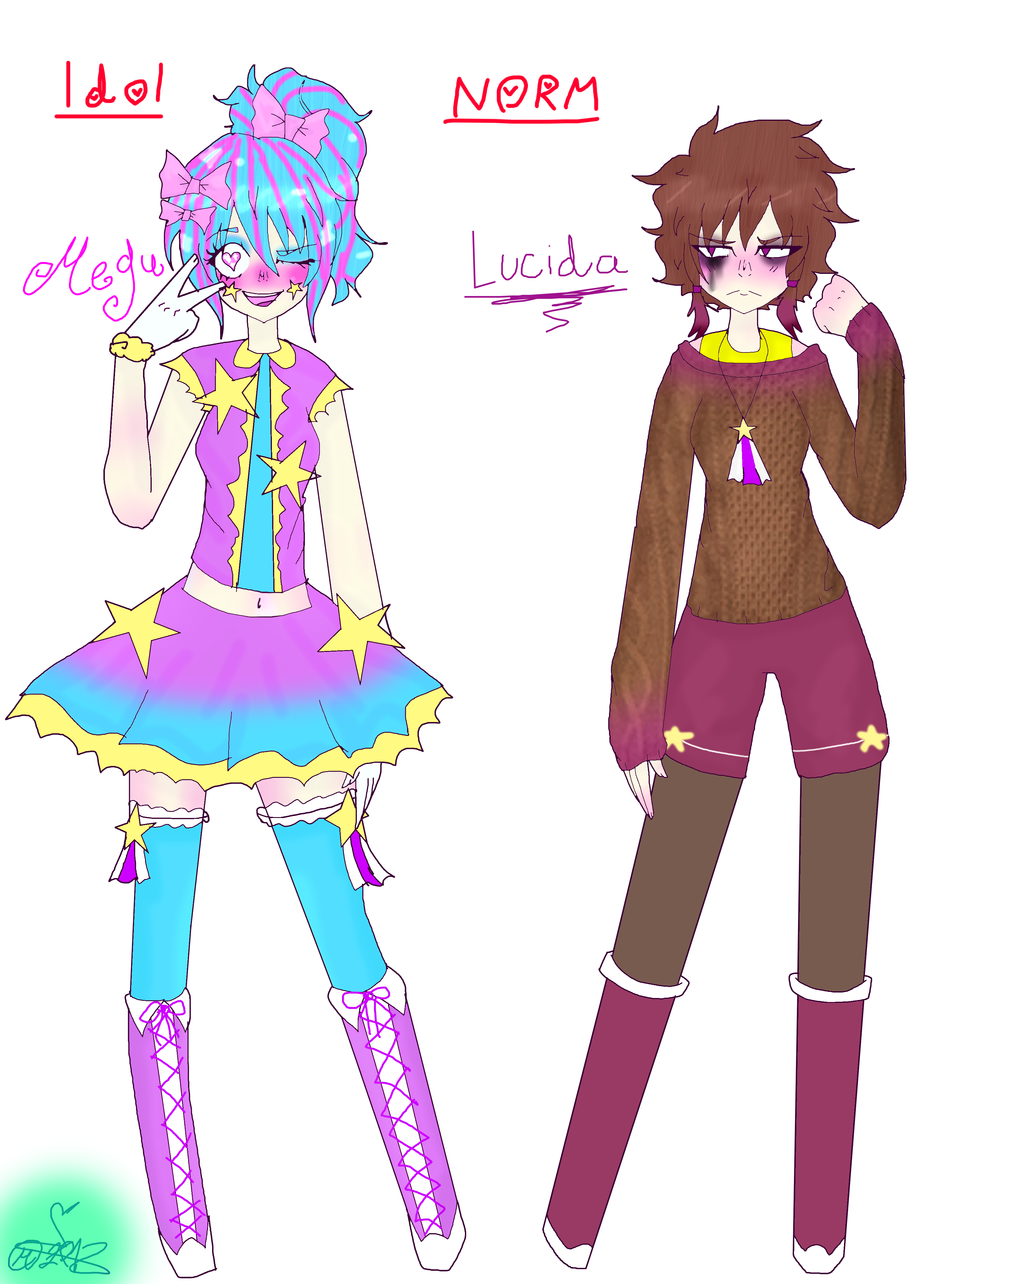 My Weird OC: Megu/Lucida by MikuBlazeTheKat